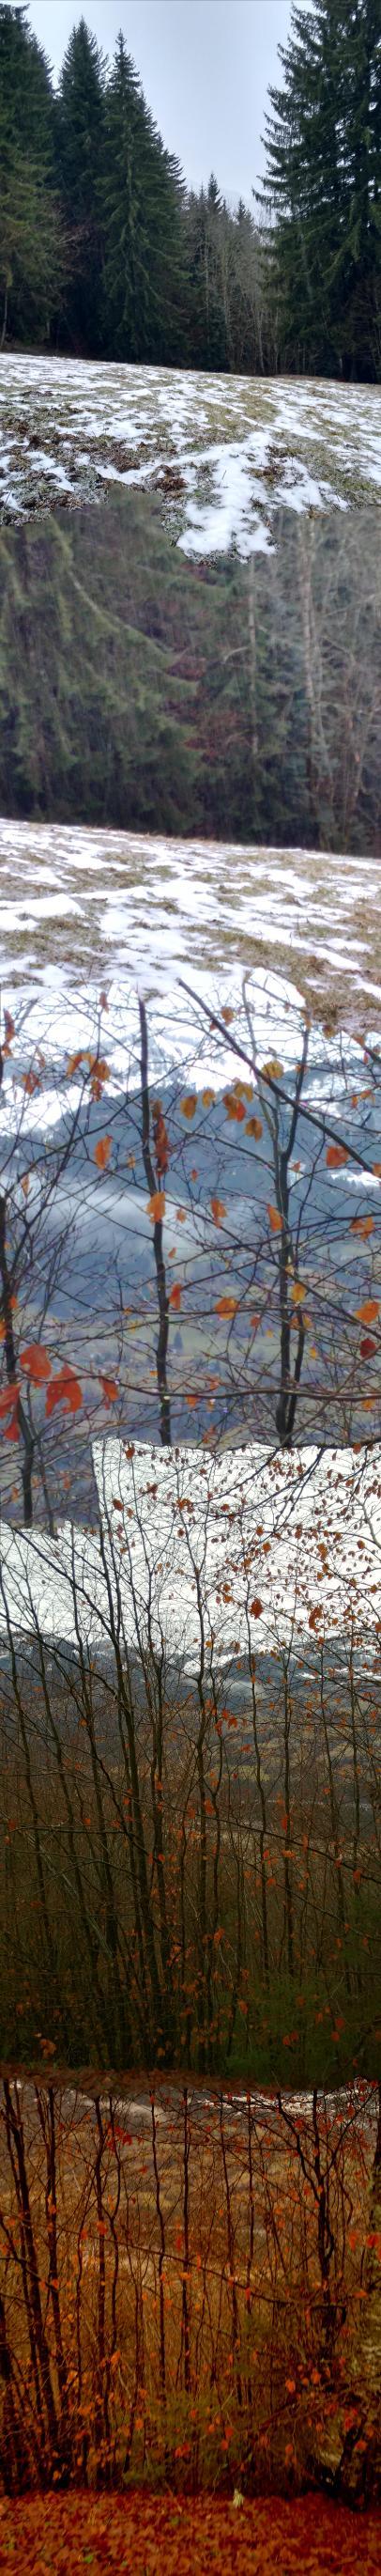 ice samoens 2 seasons